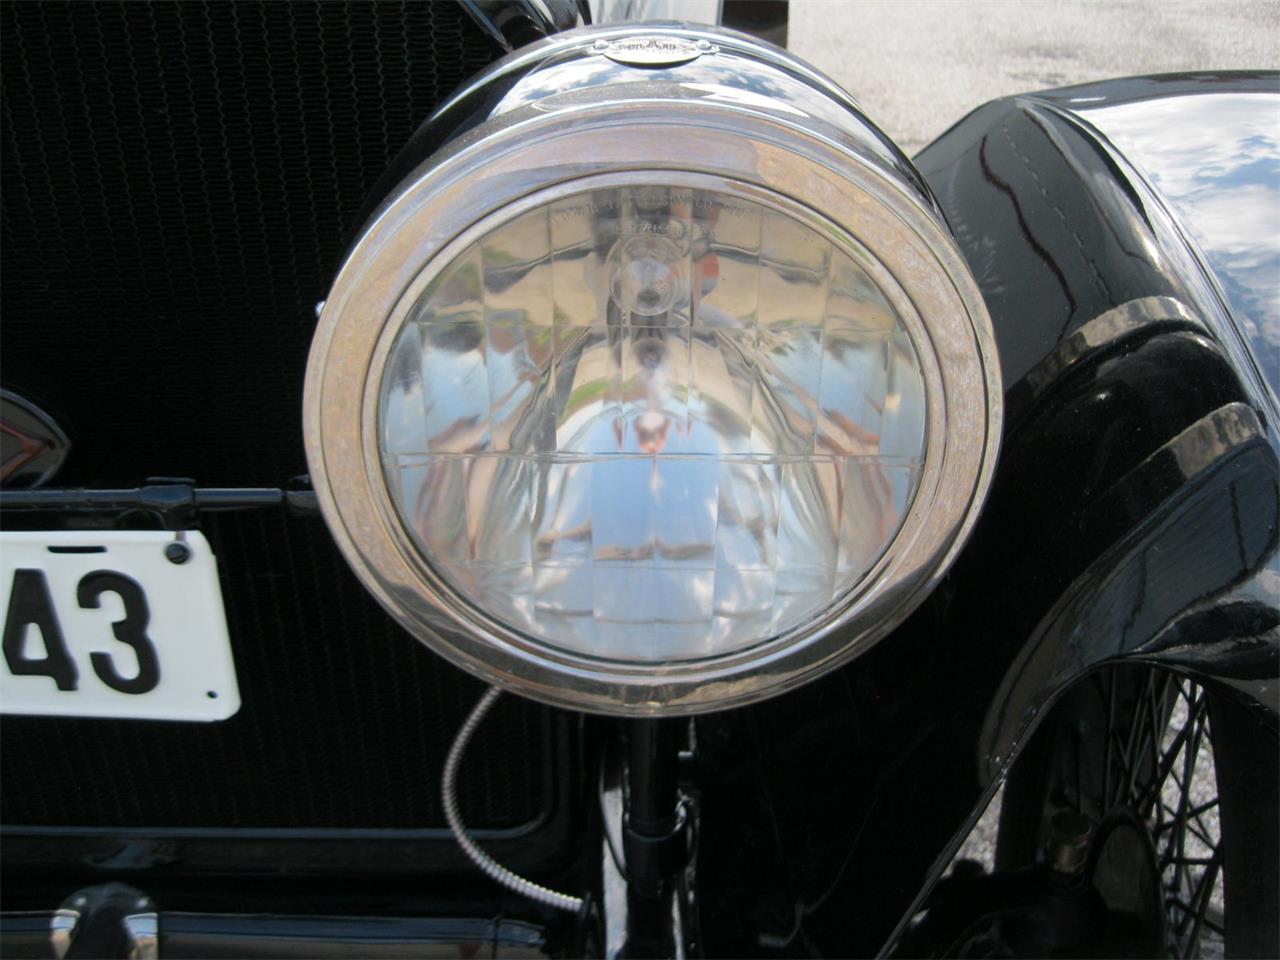 1921 Stutz Series K 6-7 Passenger Tourer (CC-1240455) for sale in Bedford Hts, Ohio